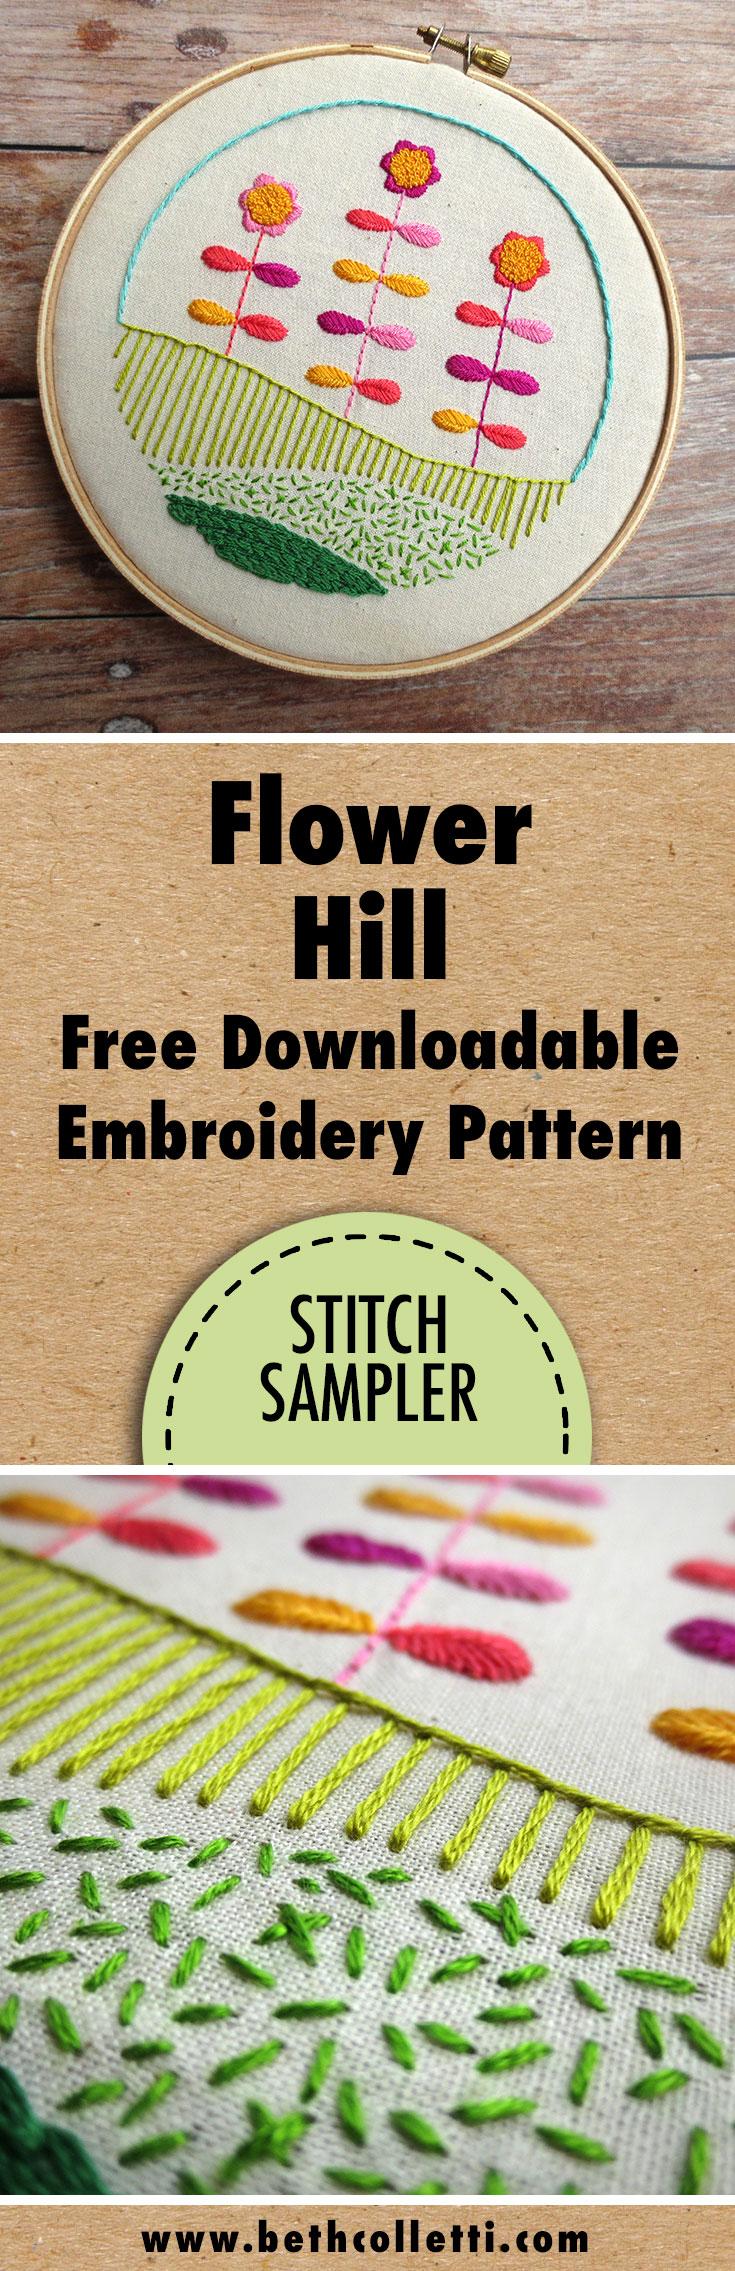 Beth_Colletti_Flower_Hill_Free_Pattern_01.jpg